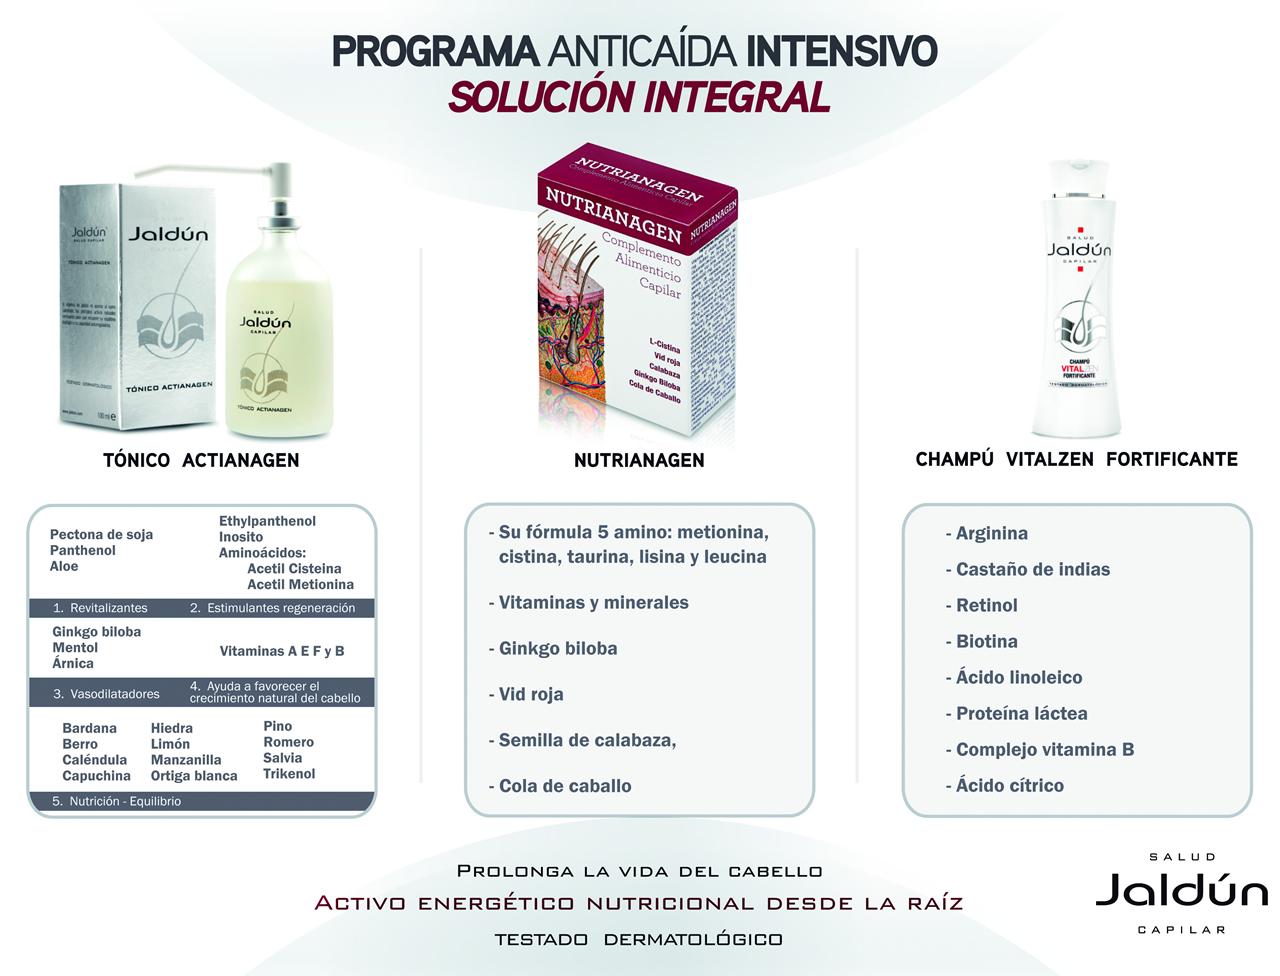 Programa Anticaída Intenso de Jaldún